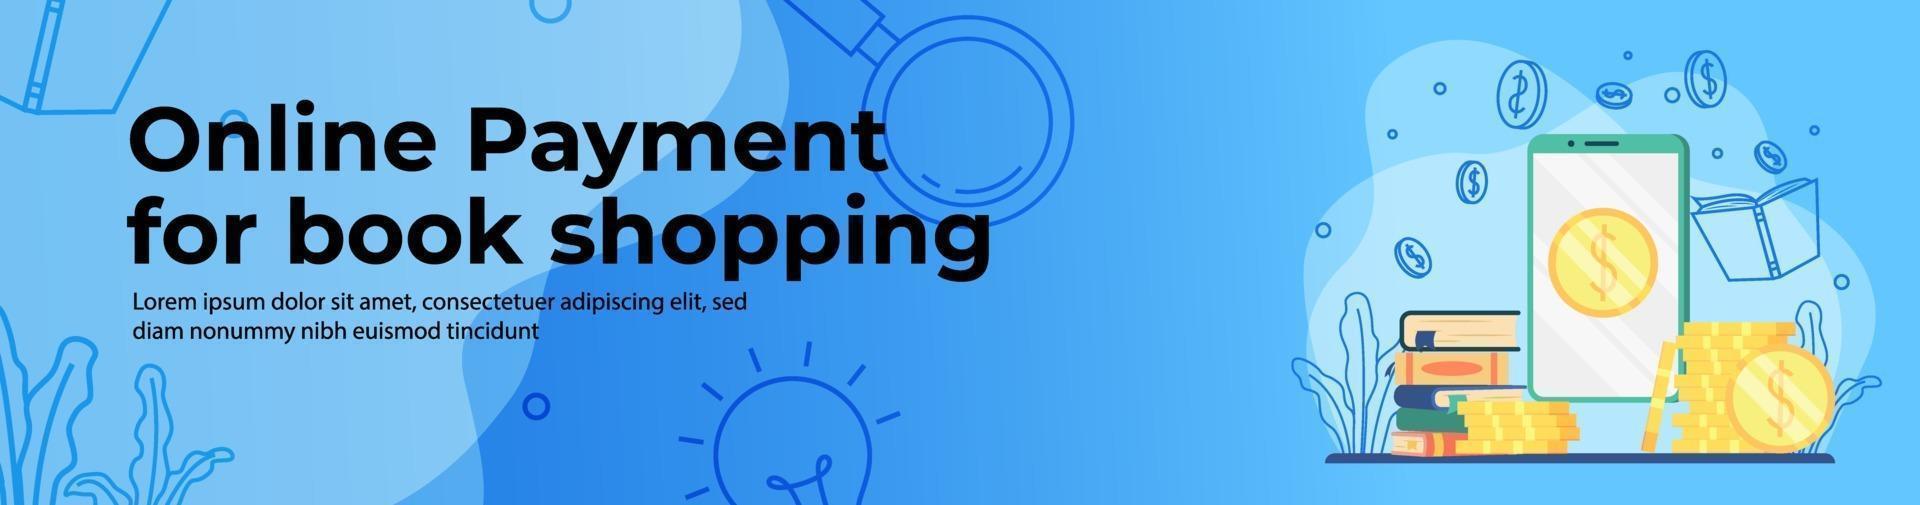 Online Shopping Web Banner Design vector